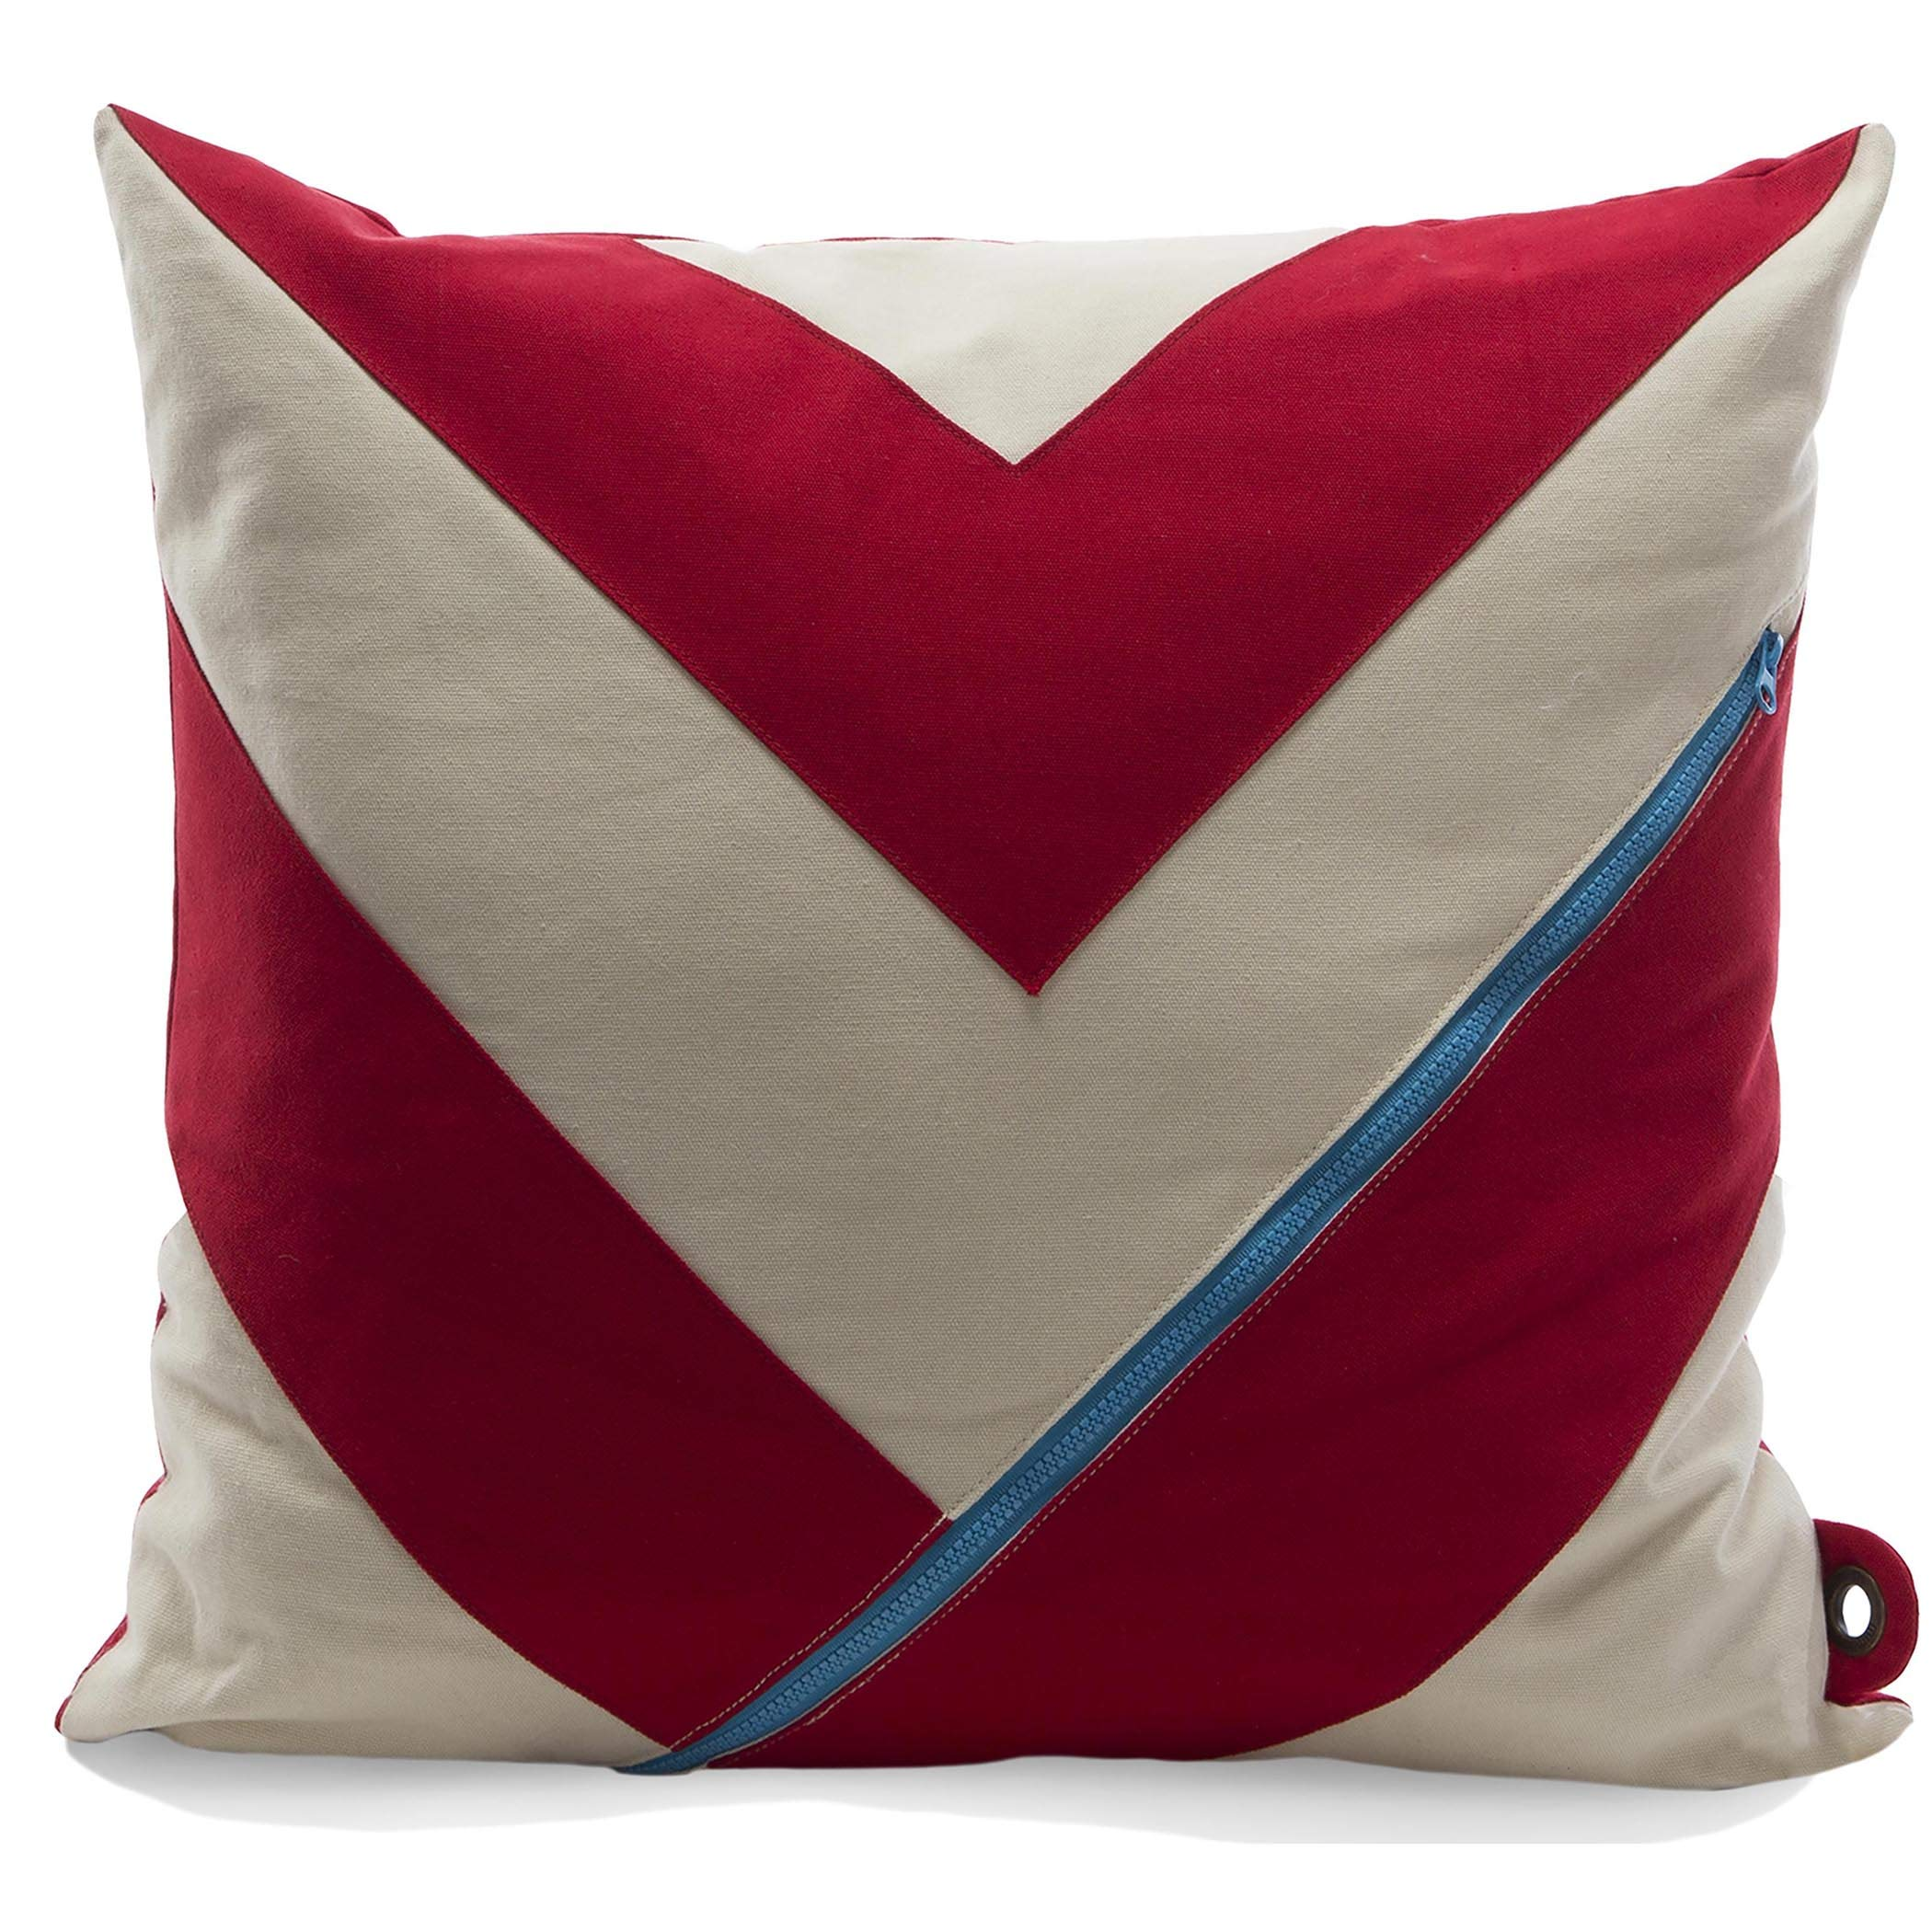 mimish Dreamer Pocket Throw Pillow - Stylish